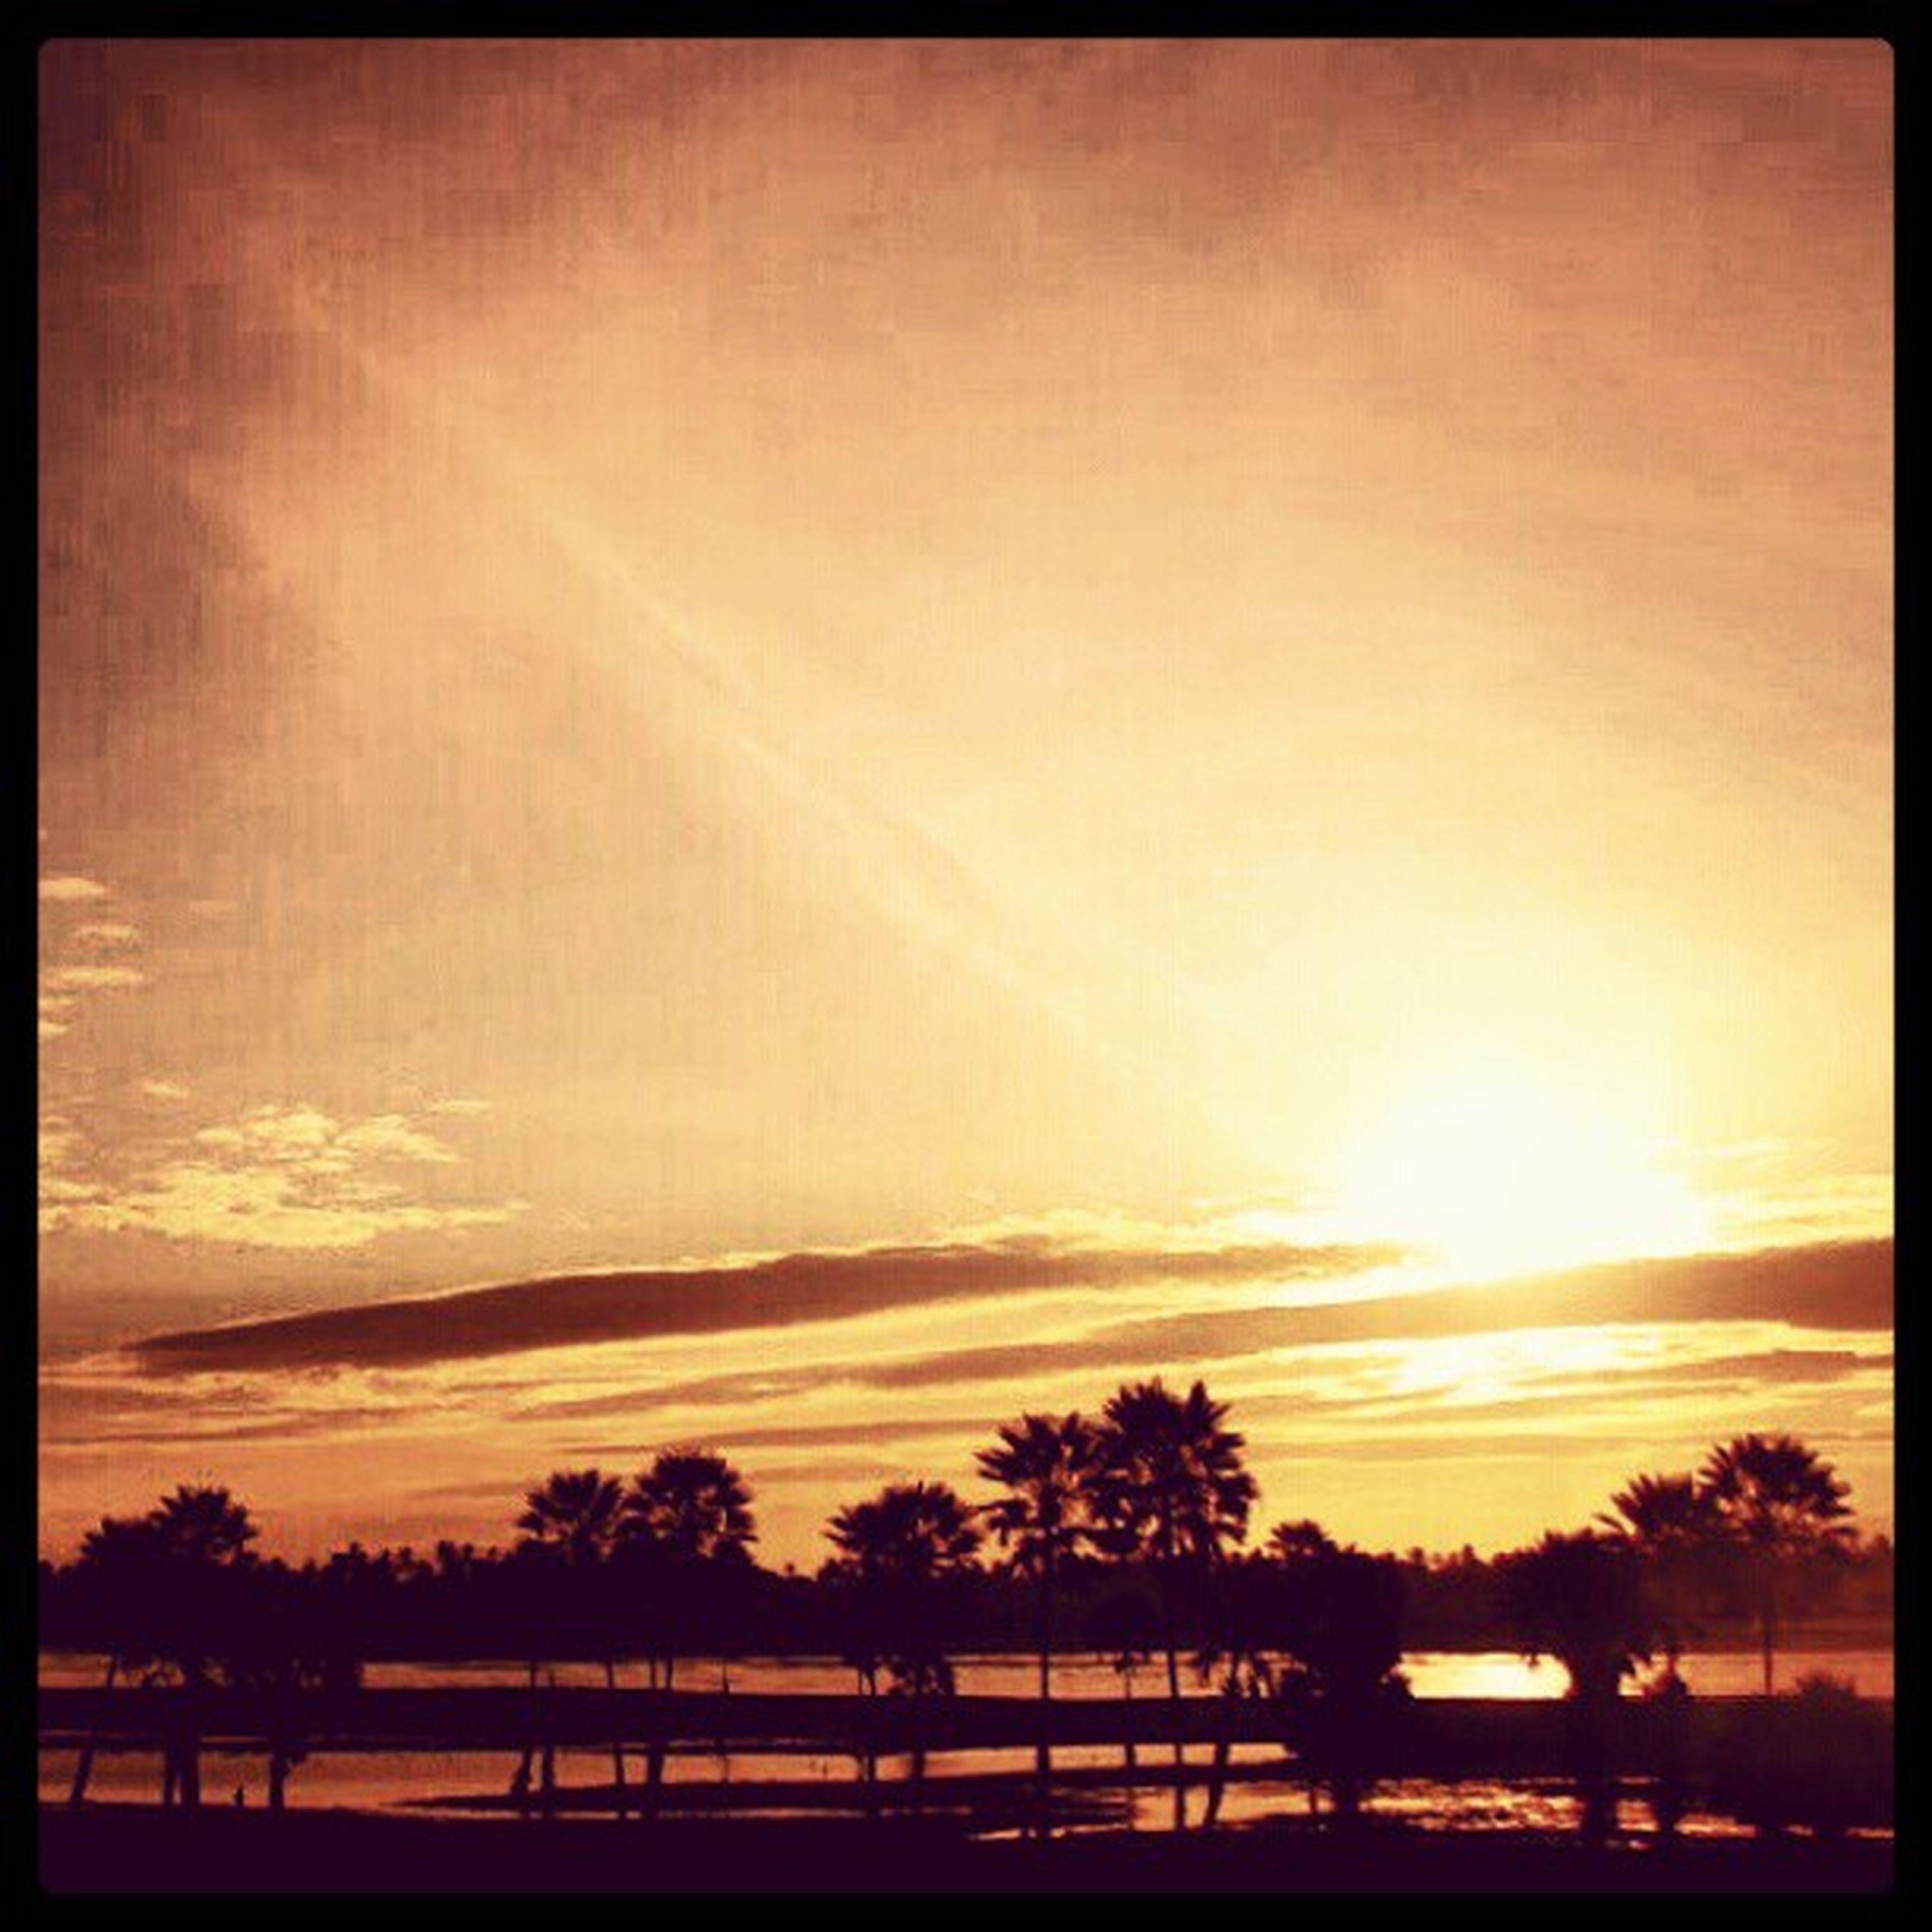 sunset, silhouette, tree, sun, beauty in nature, tranquility, transfer print, tranquil scene, scenics, sky, orange color, nature, auto post production filter, sunlight, idyllic, cloud - sky, outdoors, sunbeam, landscape, non-urban scene